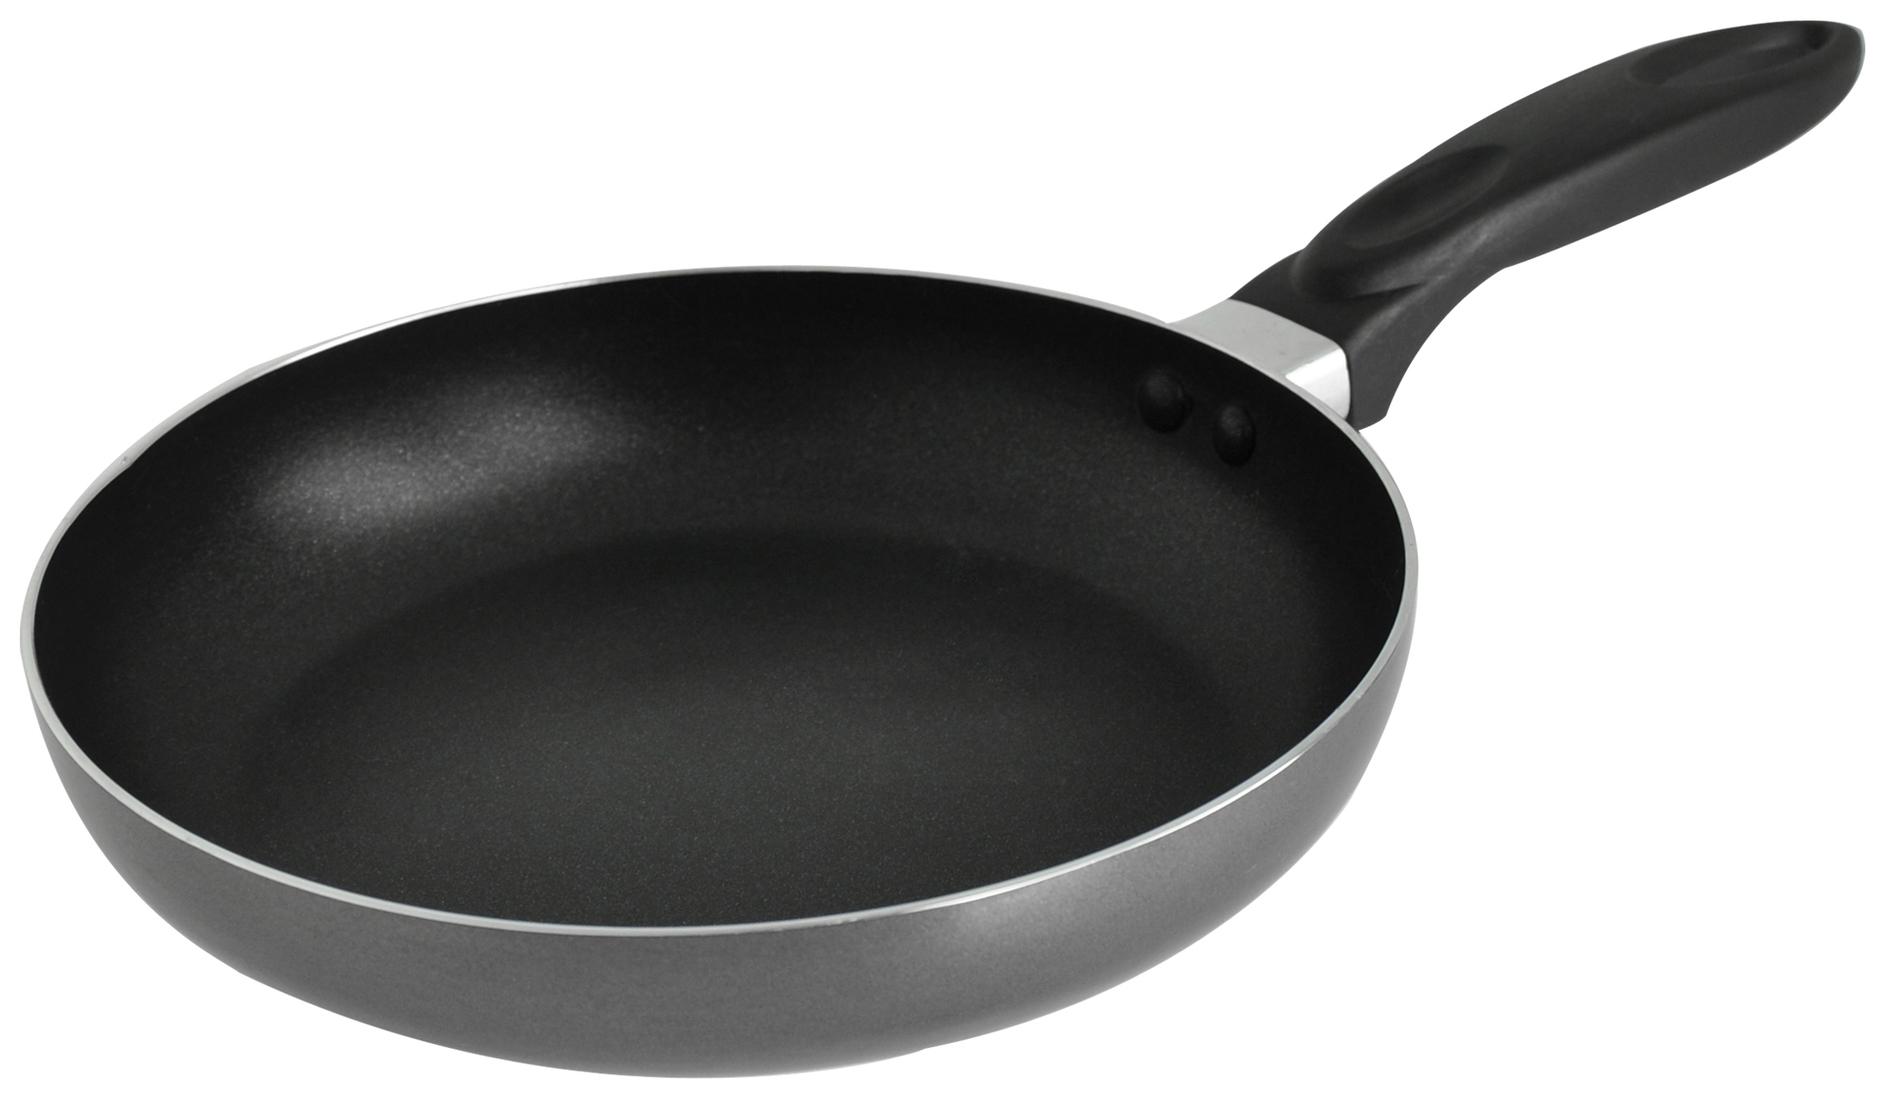 Сковорода REGENT inox 93-AL-FI-1-20 20 см